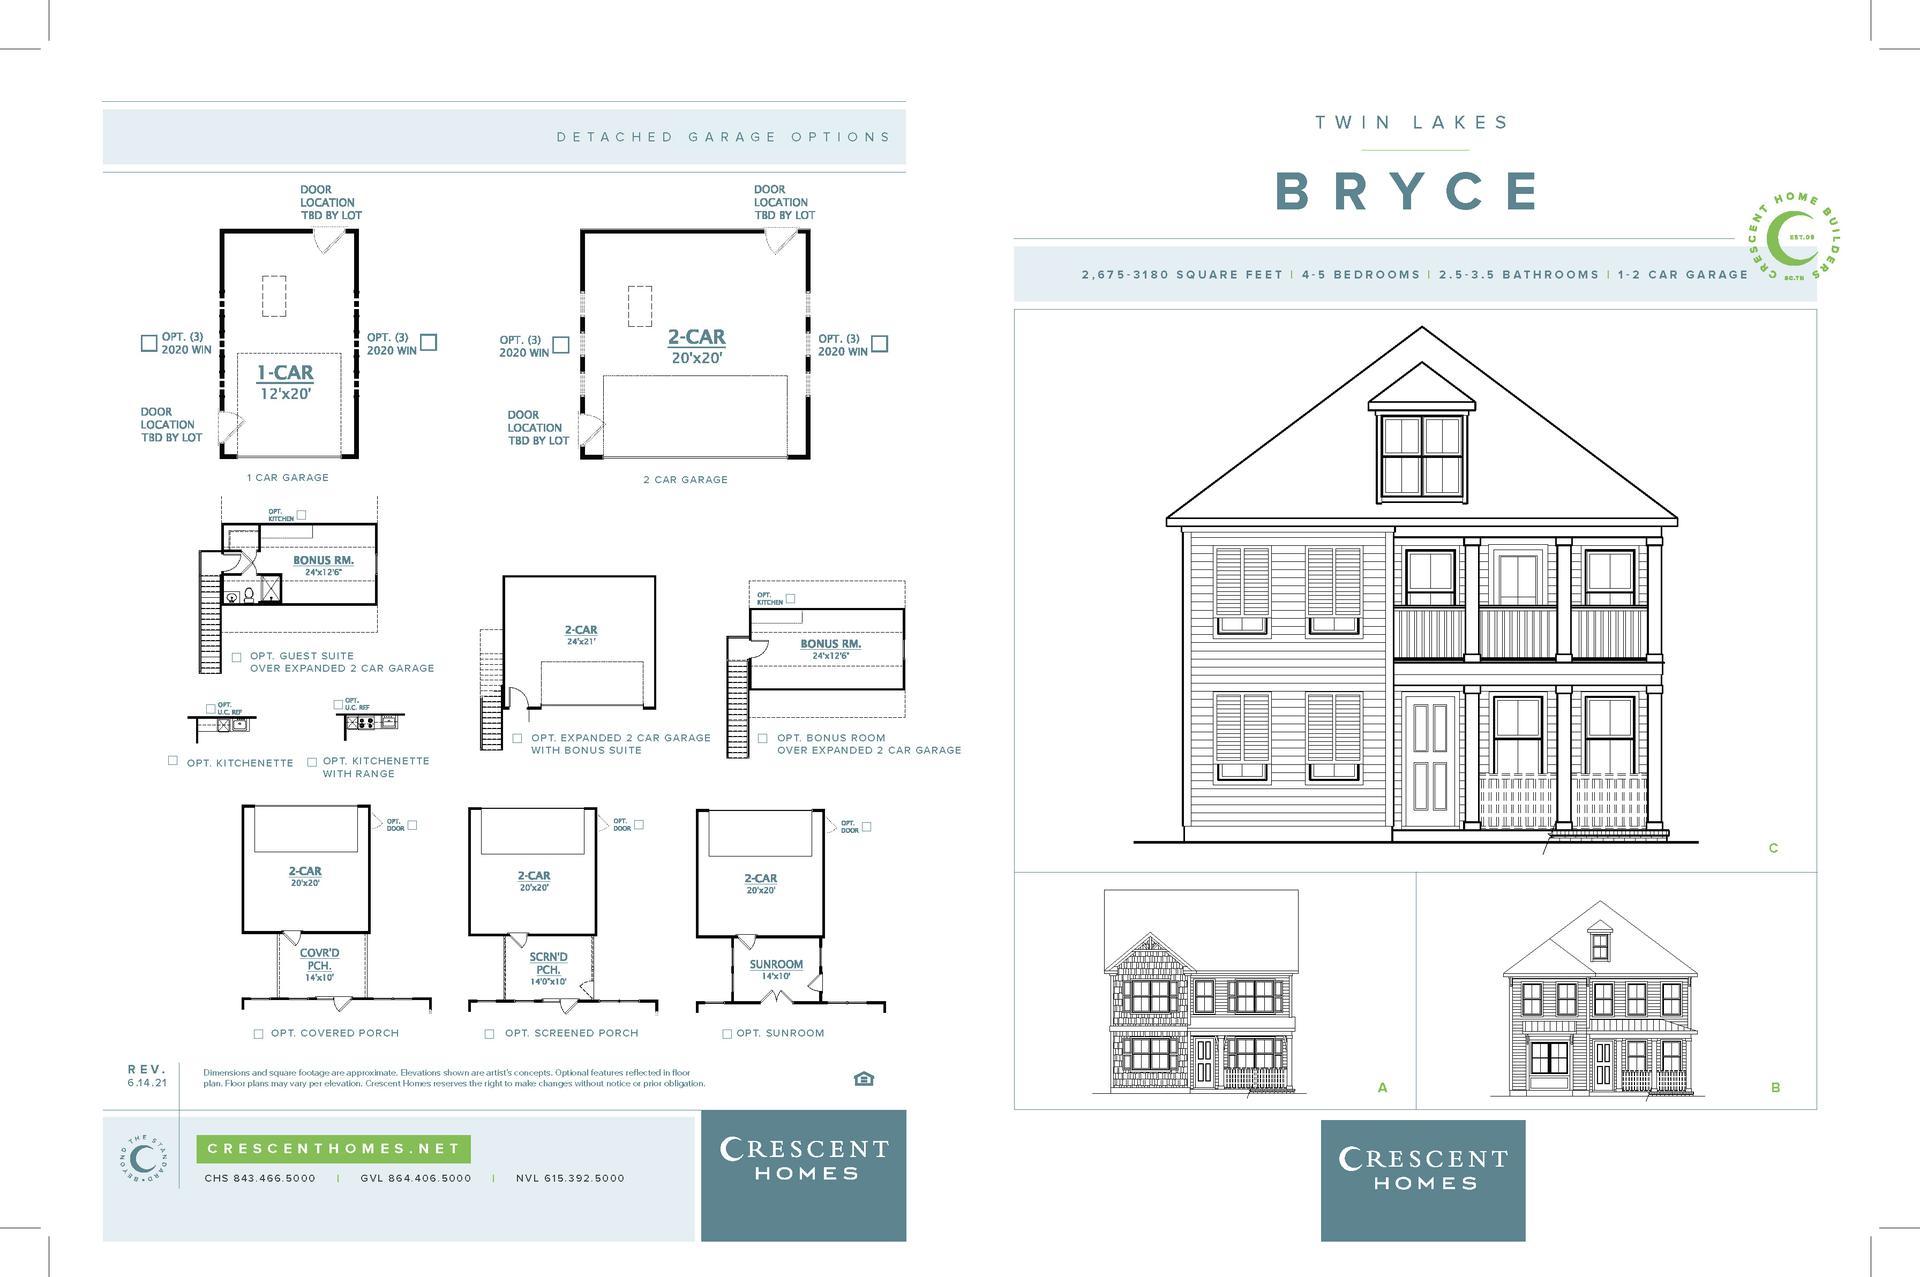 John's Island New Home Bryce Floorplan